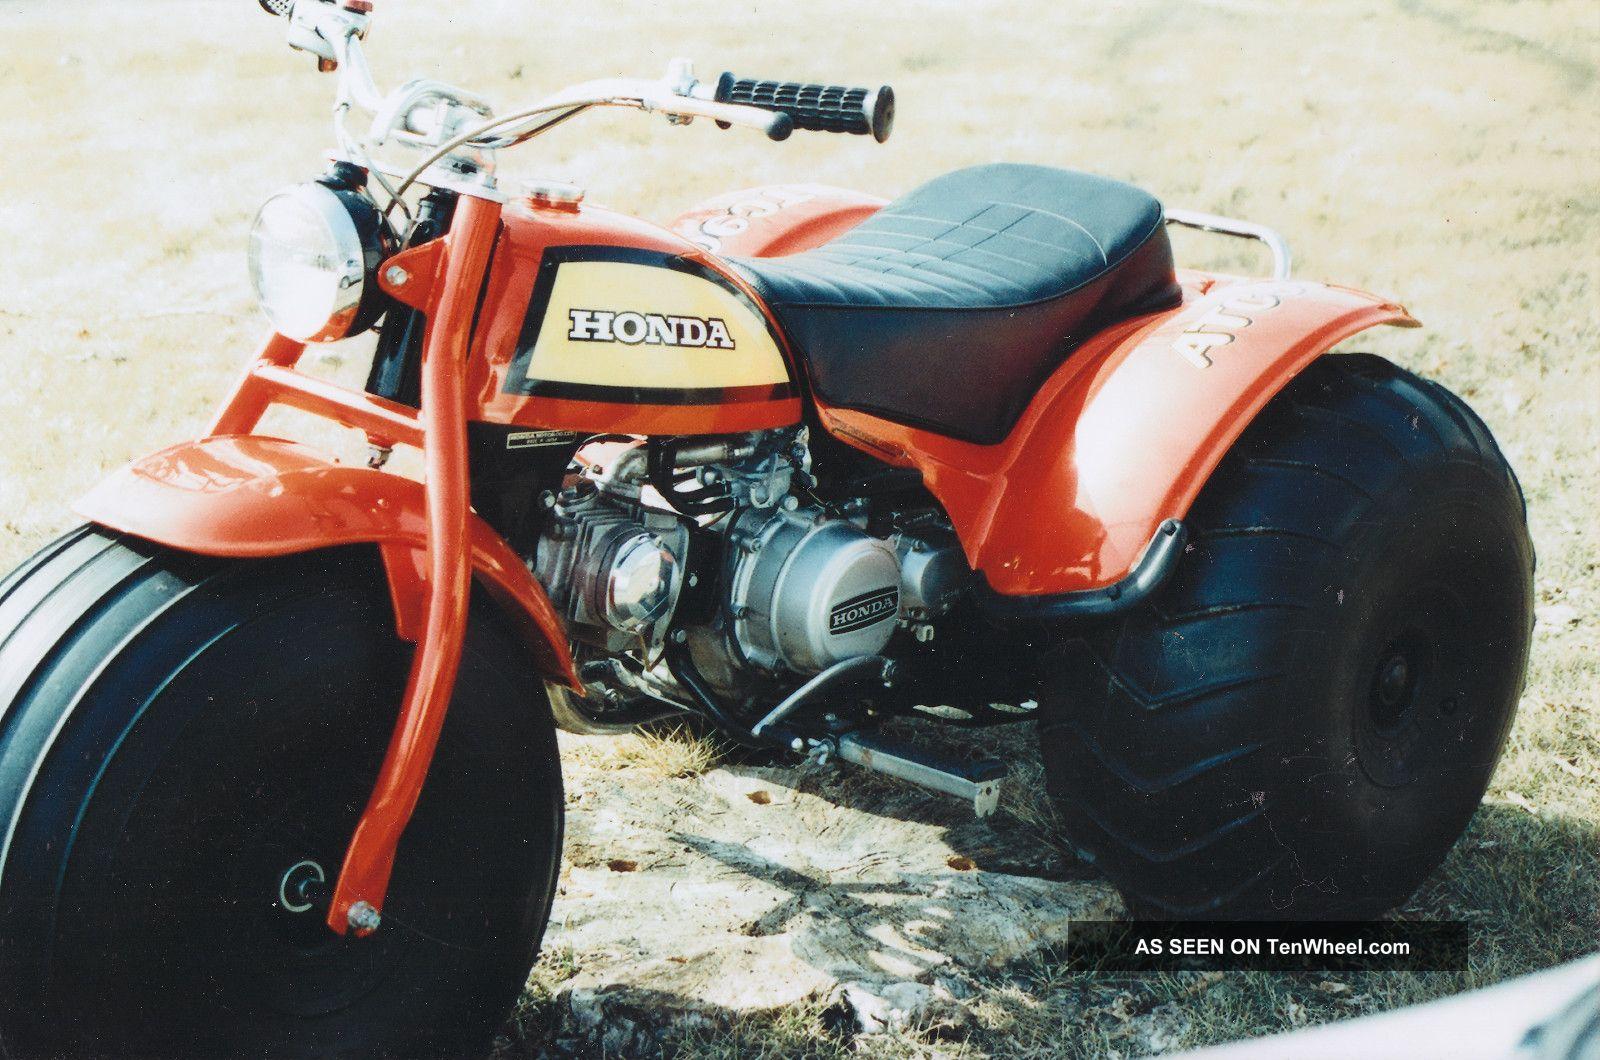 1972 Honda Atc 90 Honda photo